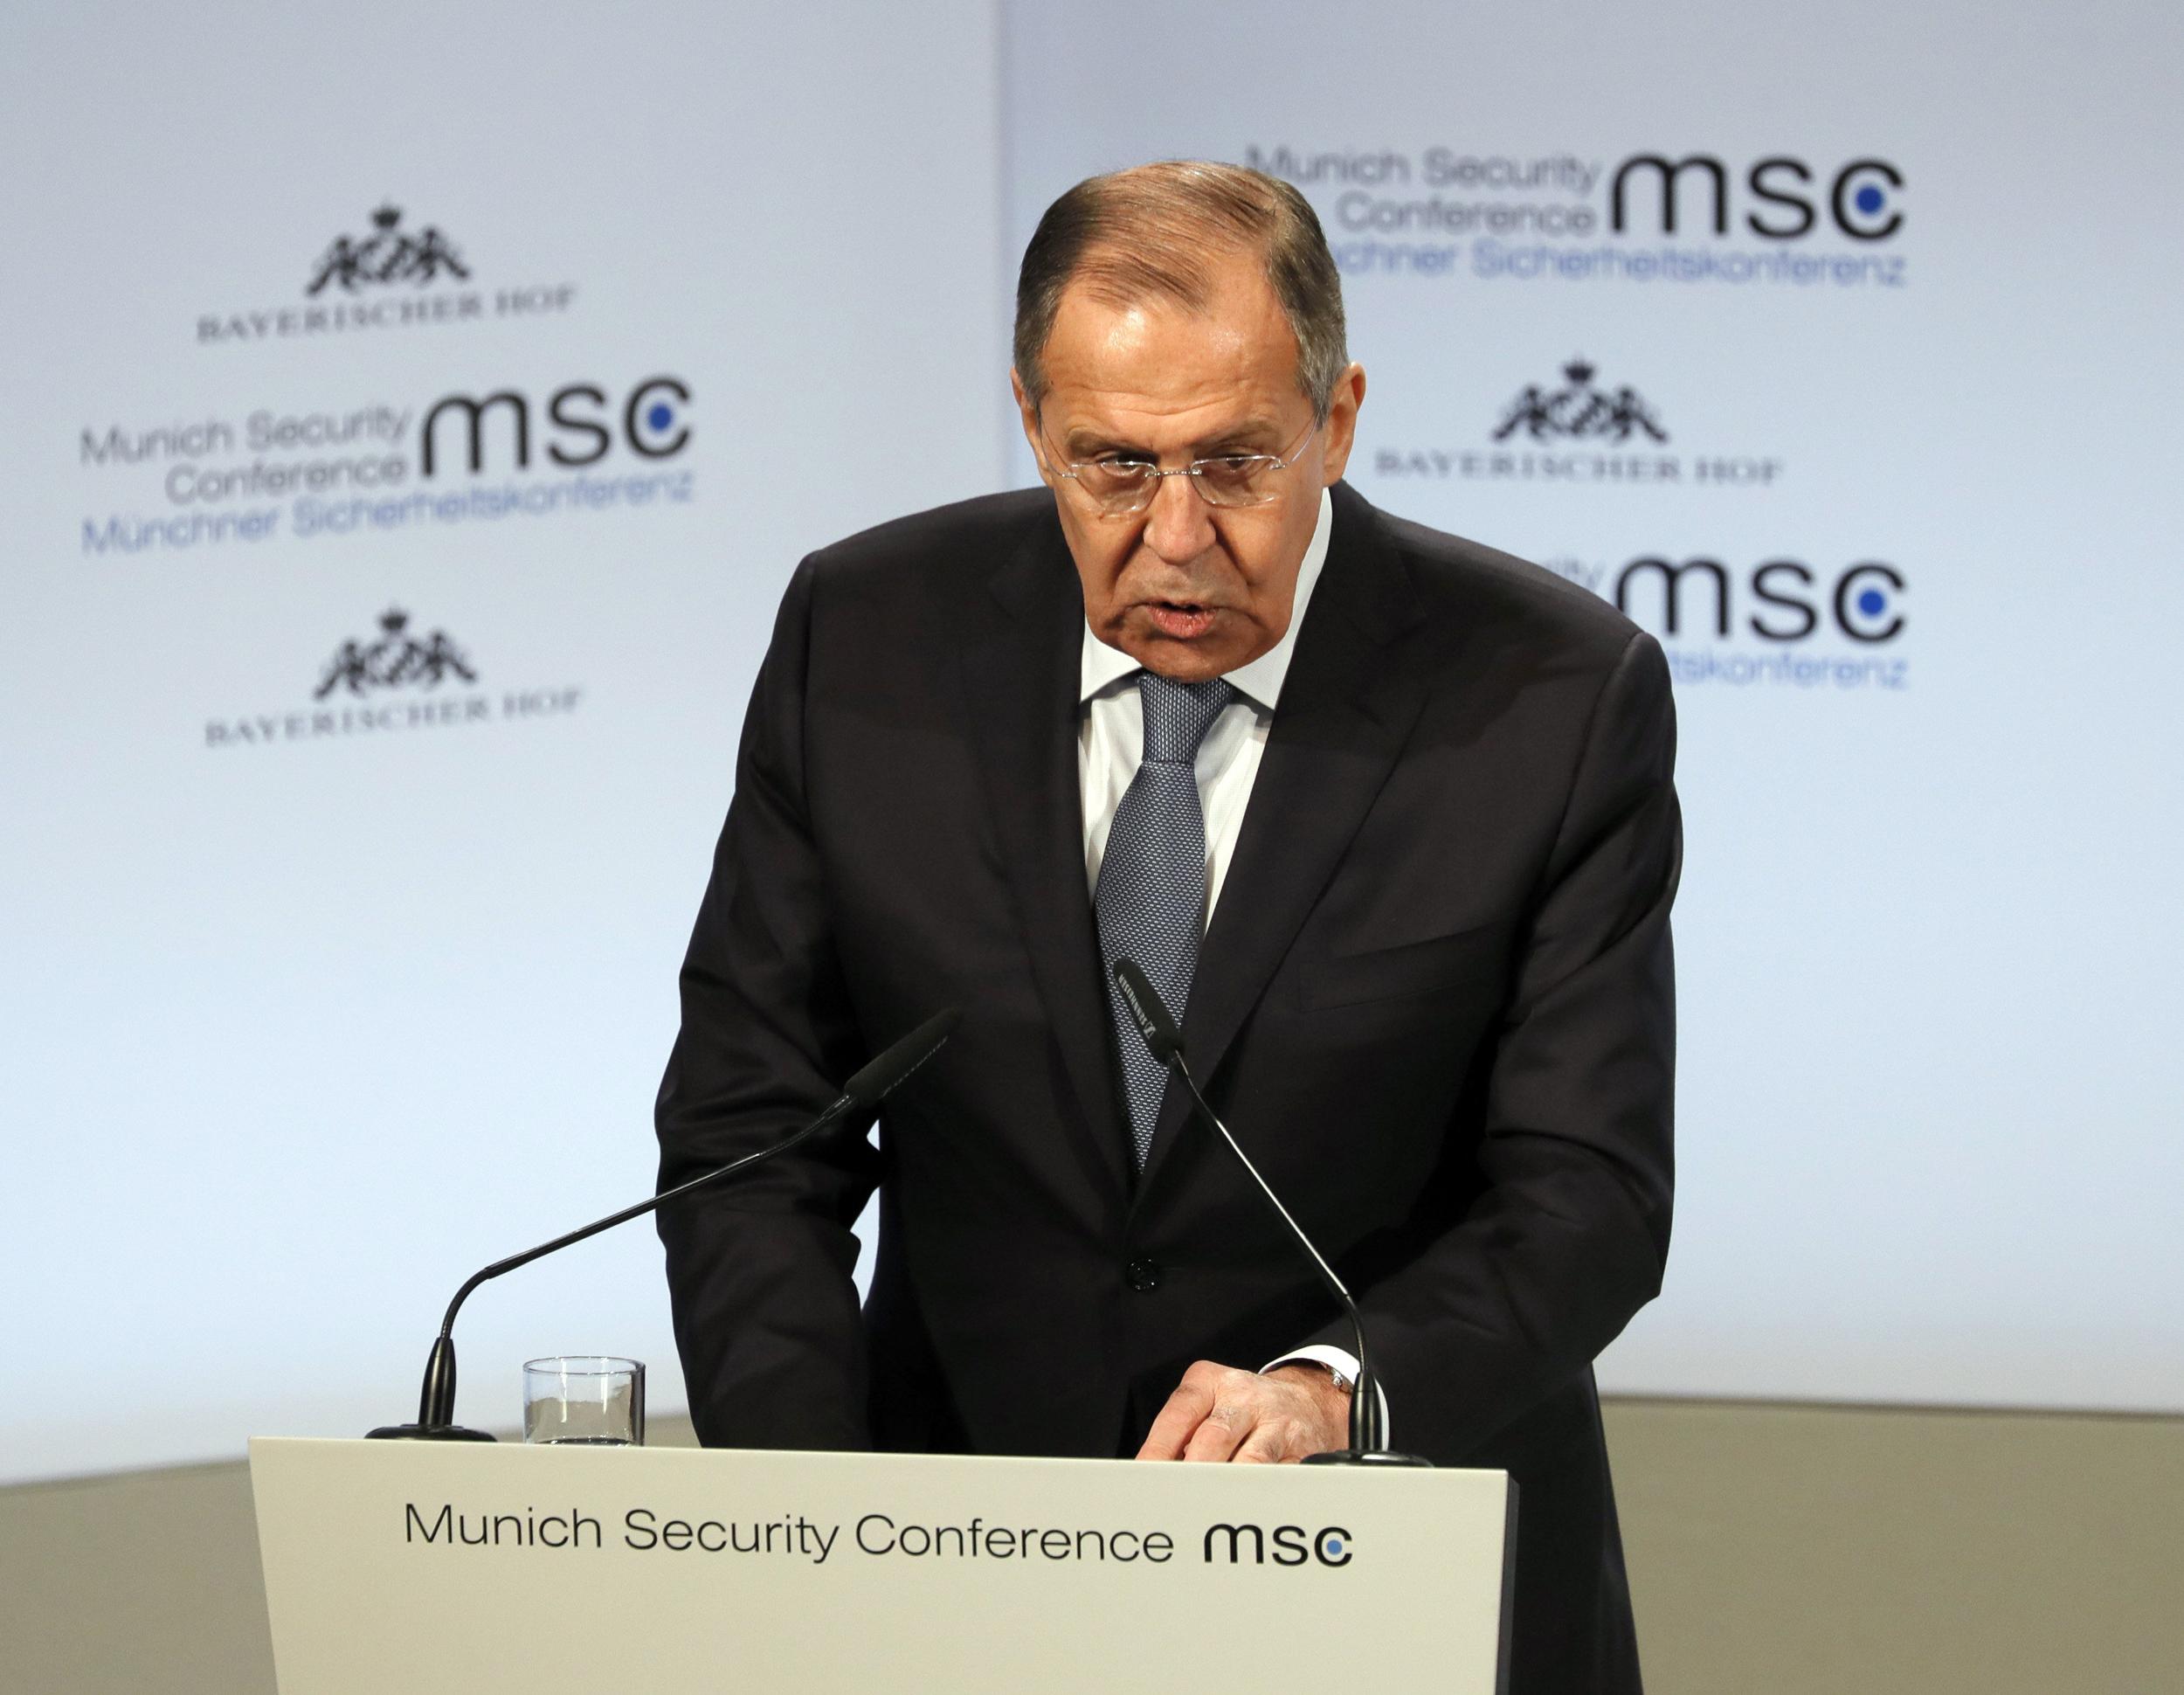 'Just blabber': Russia's Lavrov dismisses FBI indictments